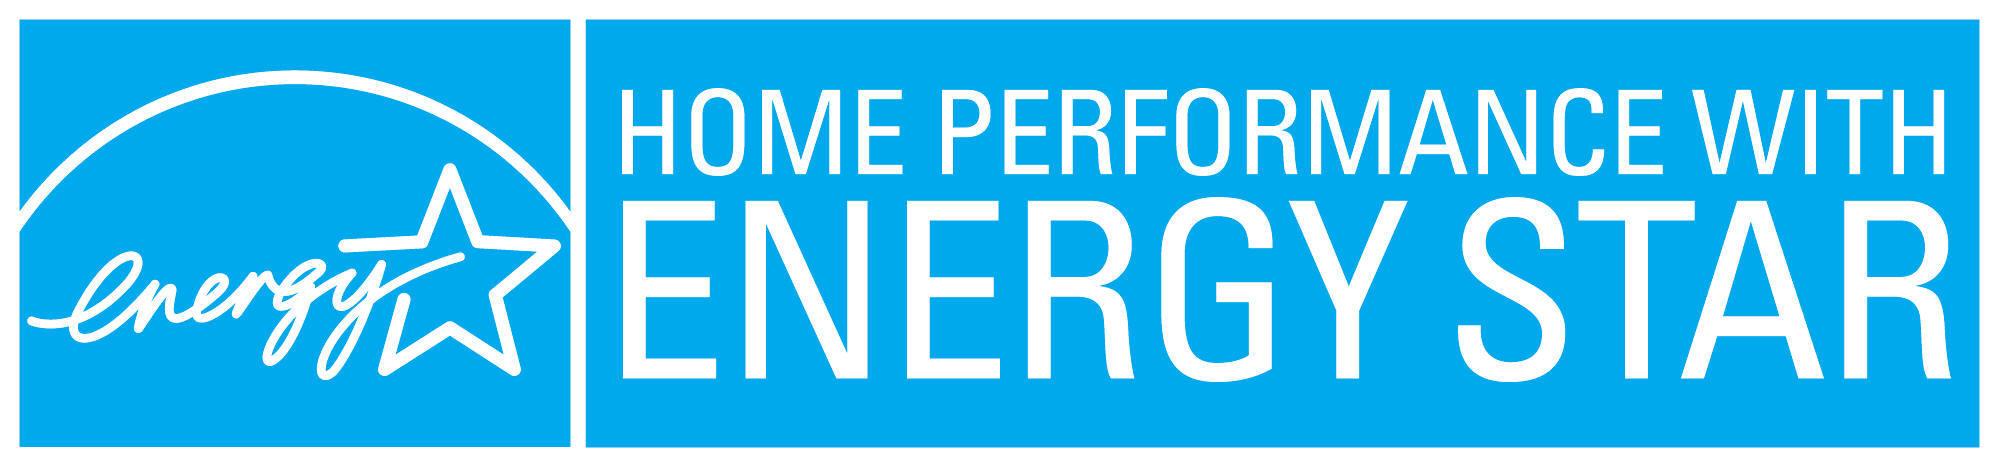 HomePerformanceES_Logo.jpg